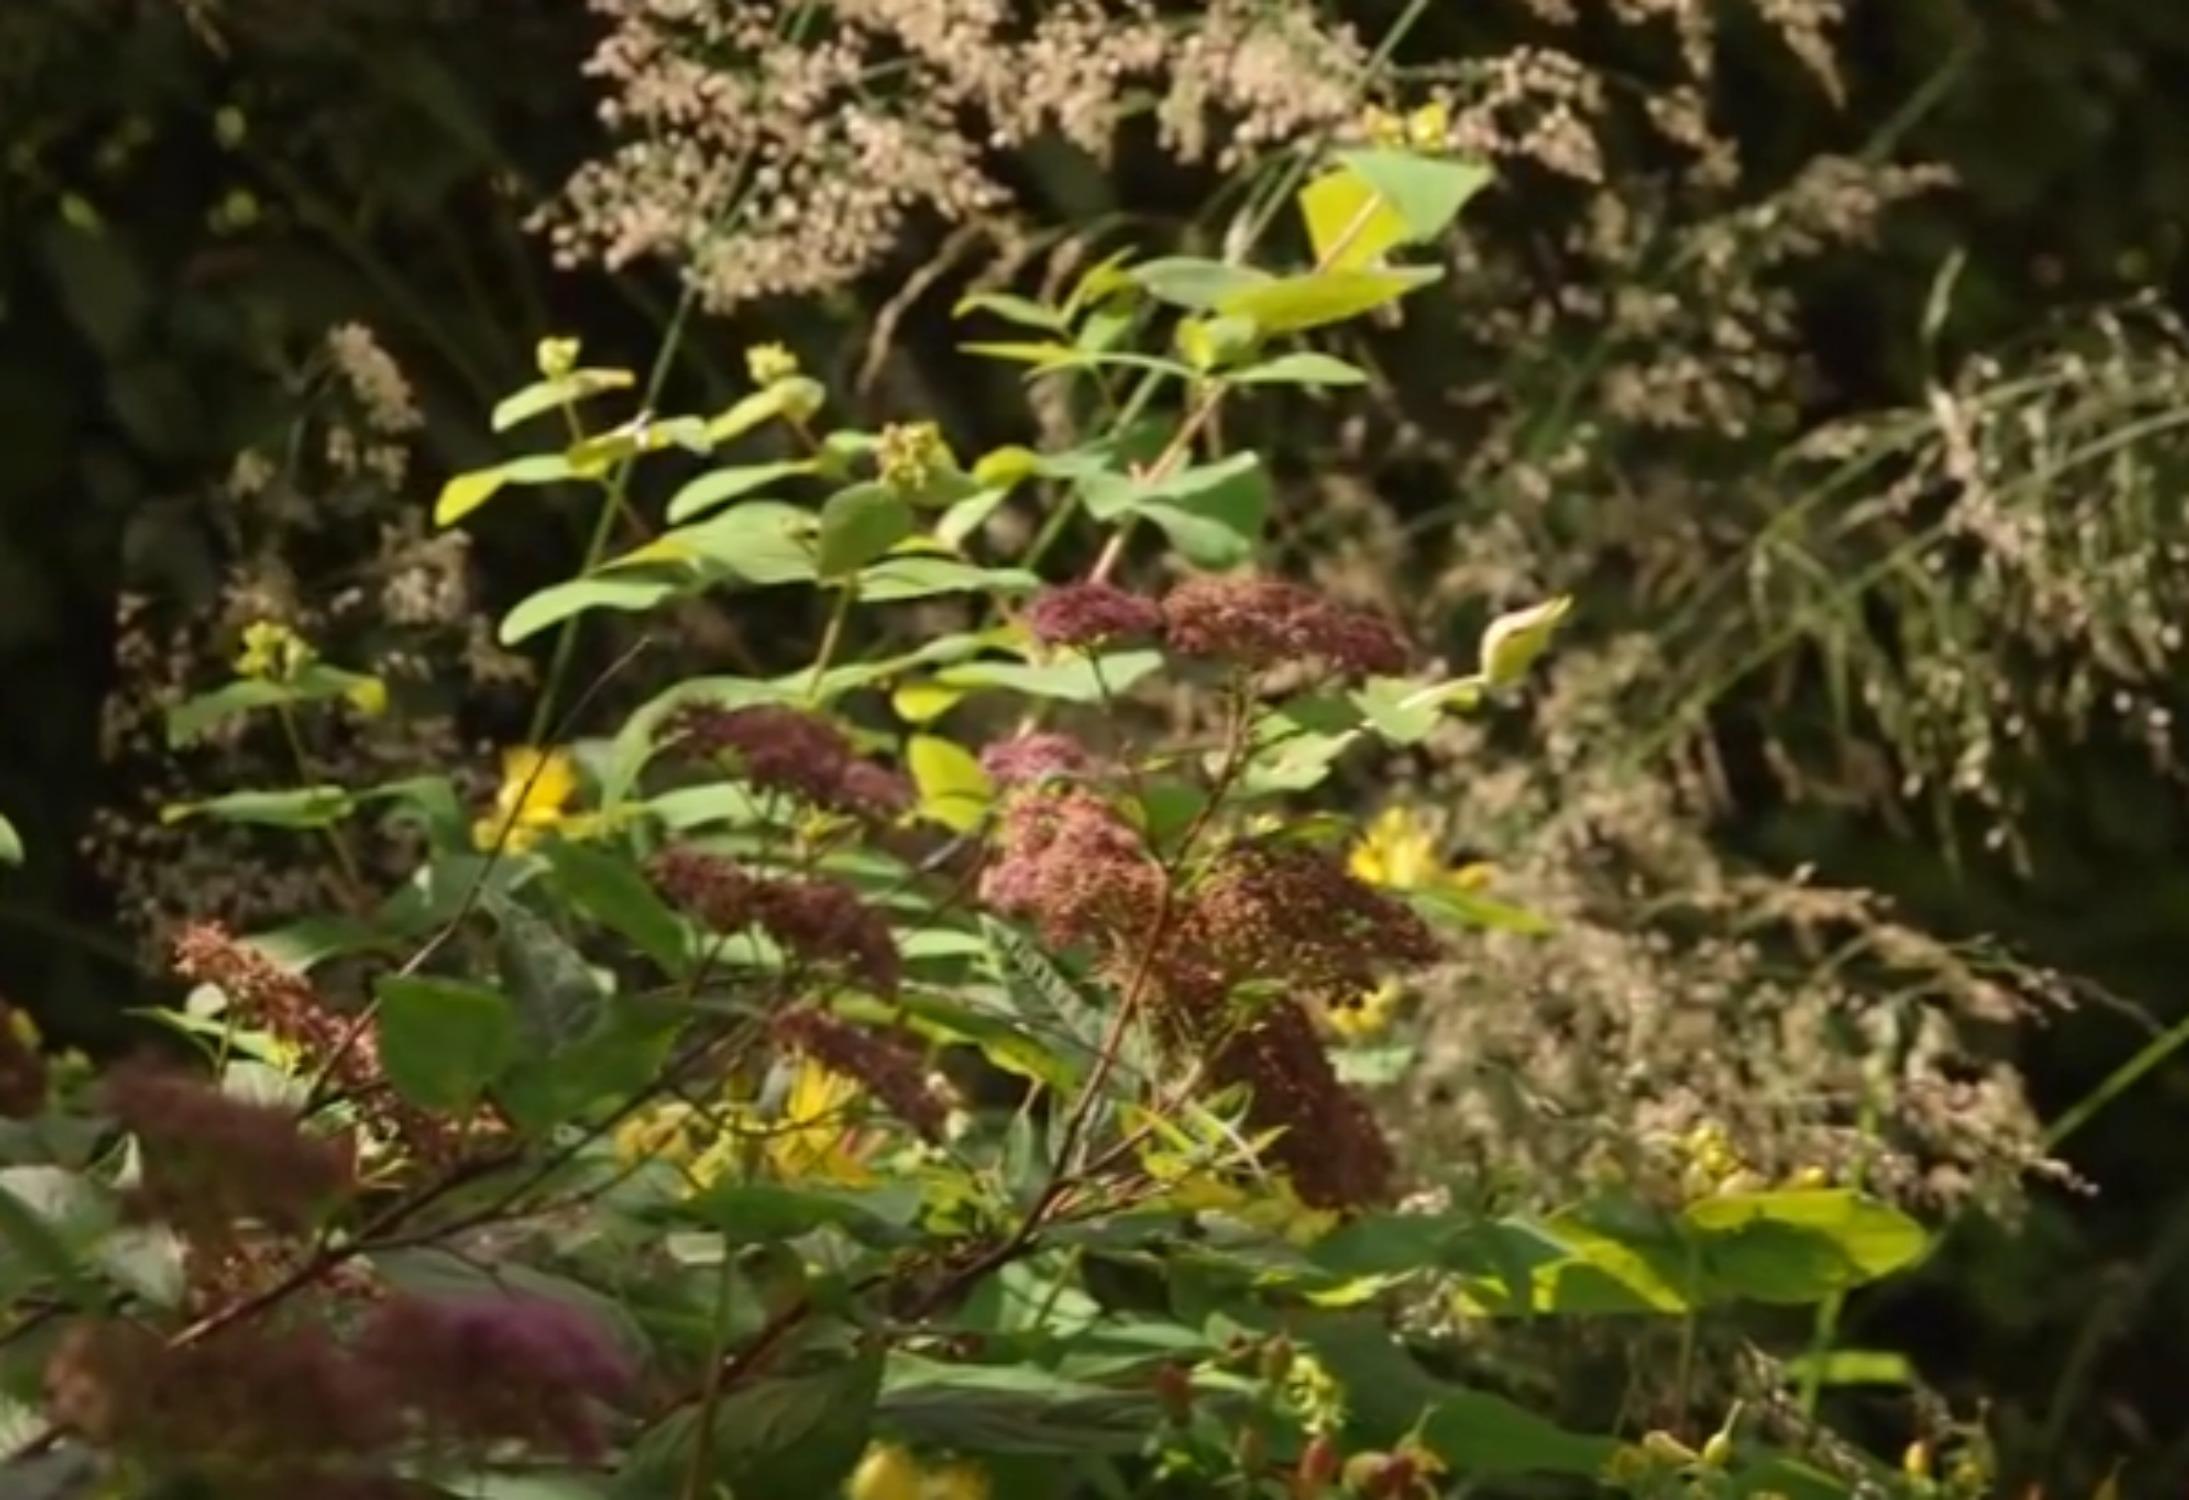 Jardins et gens du Nord : le jardin des fées